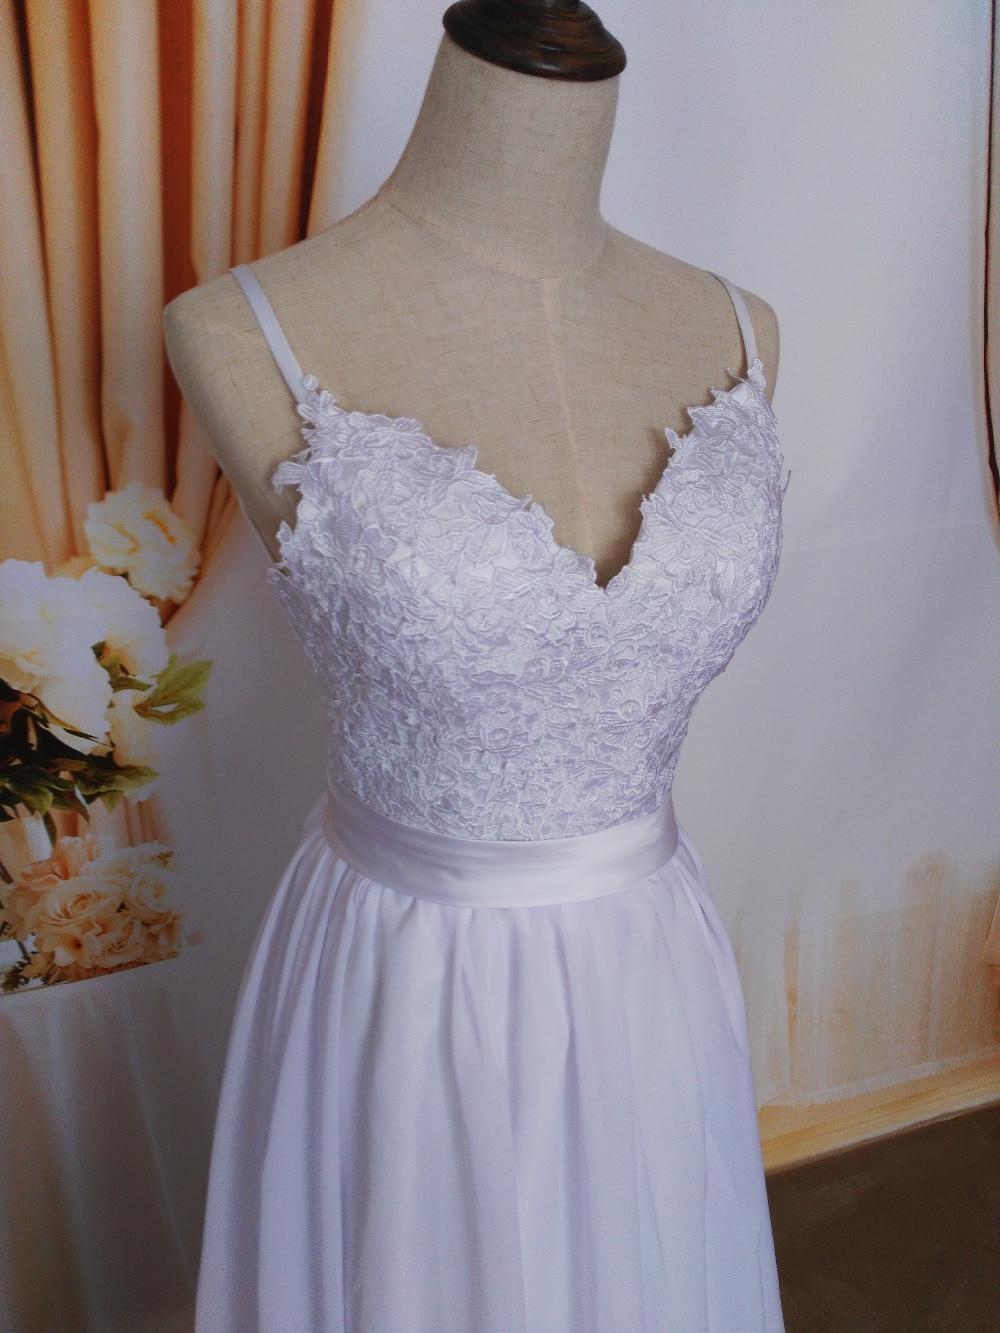 42c065f56 ZJ9113 العميق الخامس الرقبة فستان السهرة الشيفون طويل ماكسي زائد الحجم  تصميم fashional